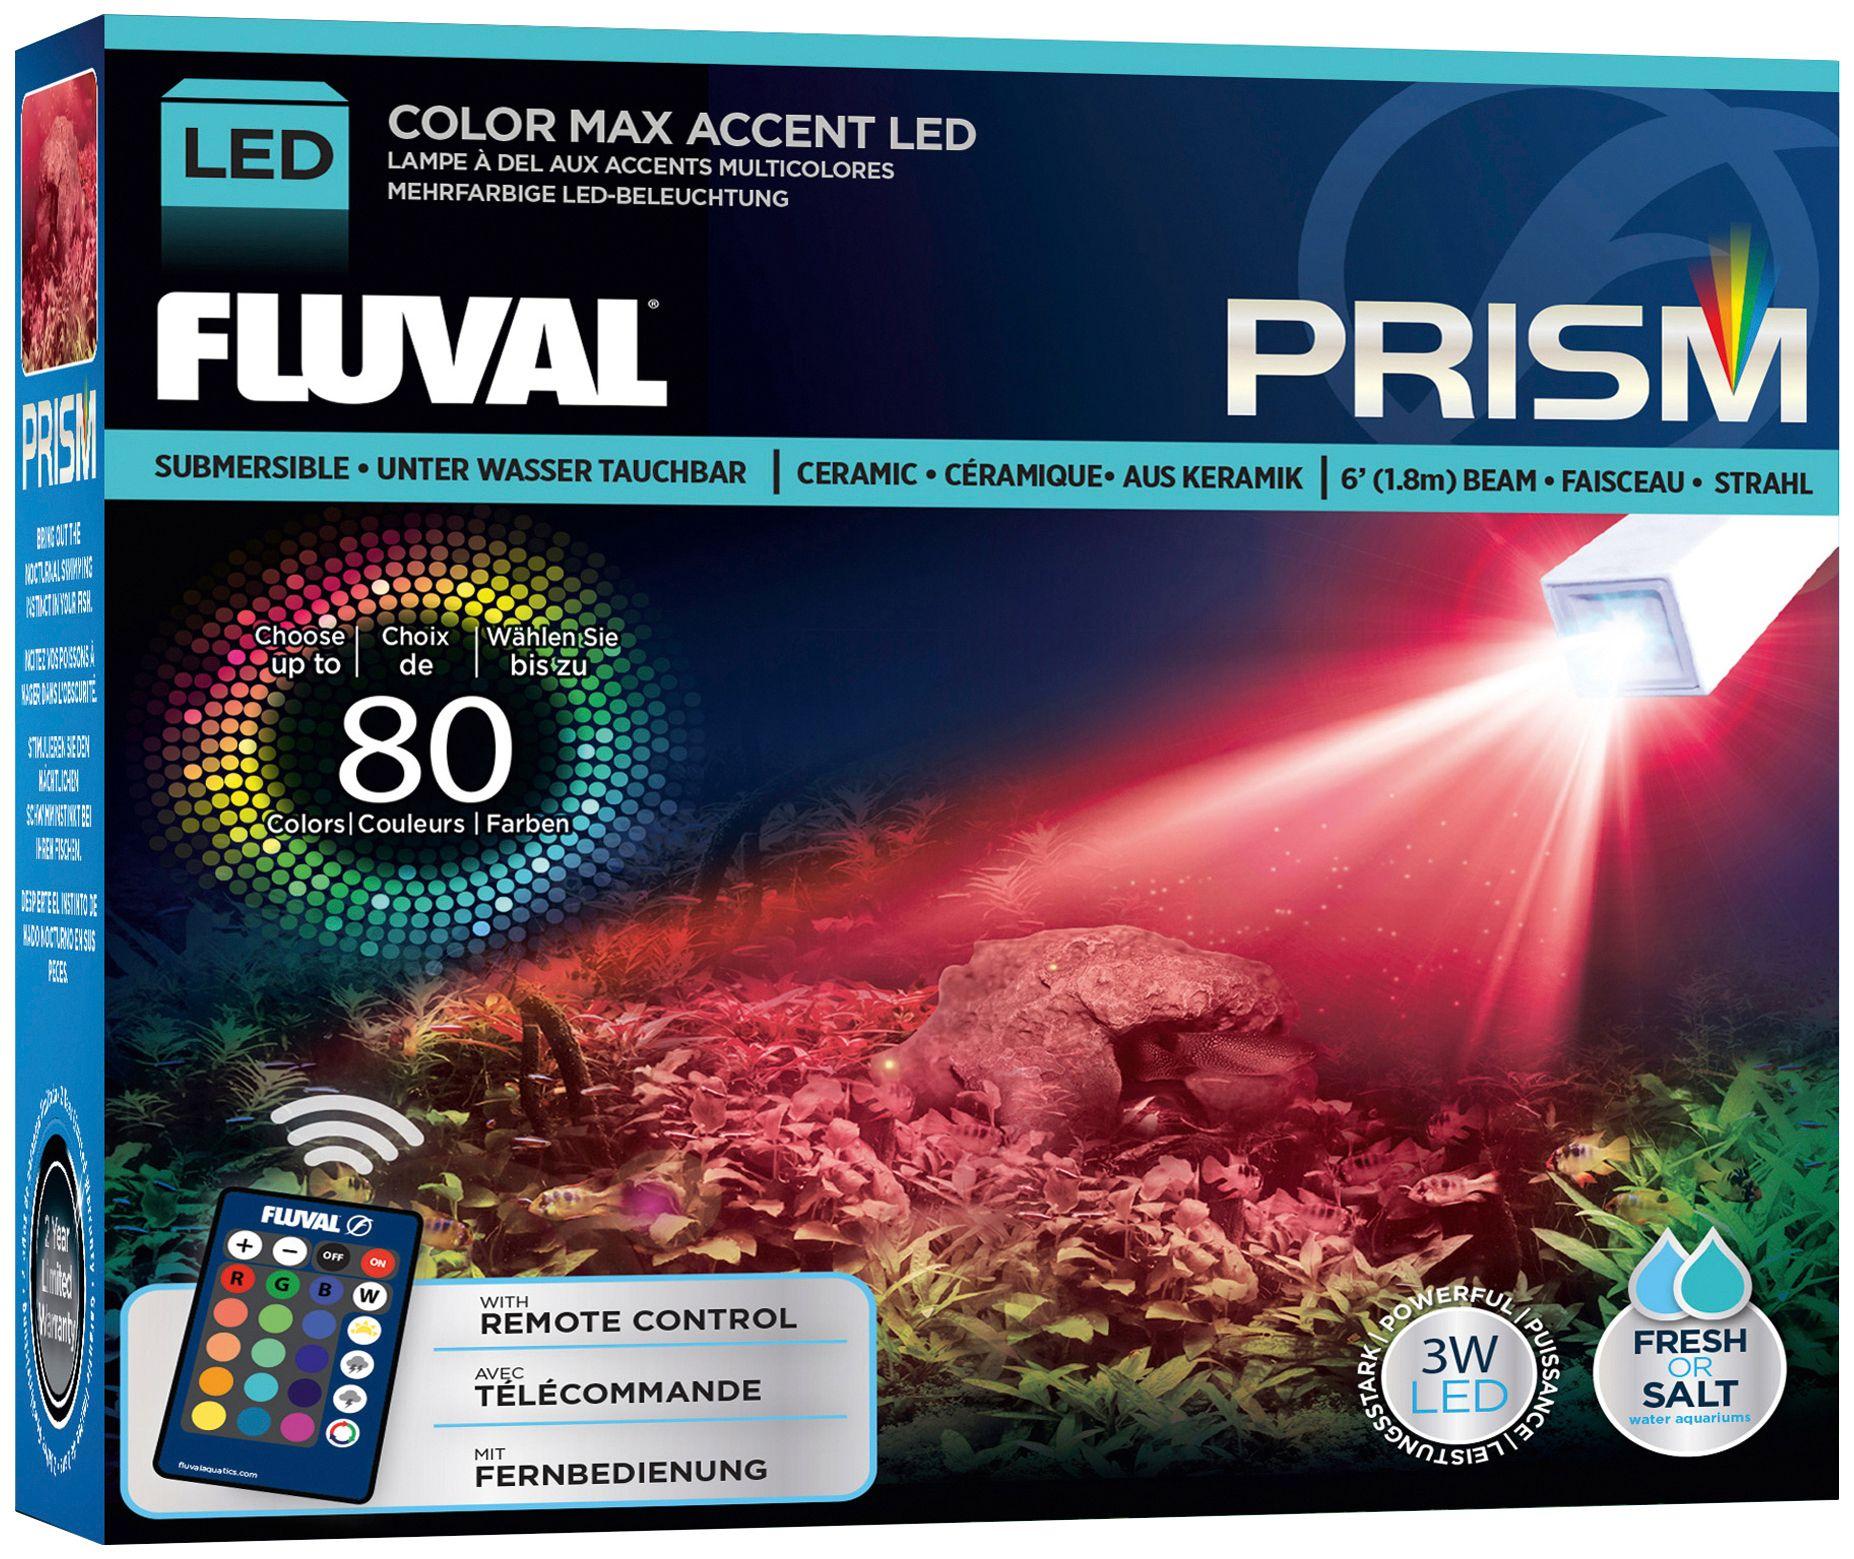 FLUVAL Fluval LED-Aquarien-Beleuchtung »PRISM Keramik LED Spot«